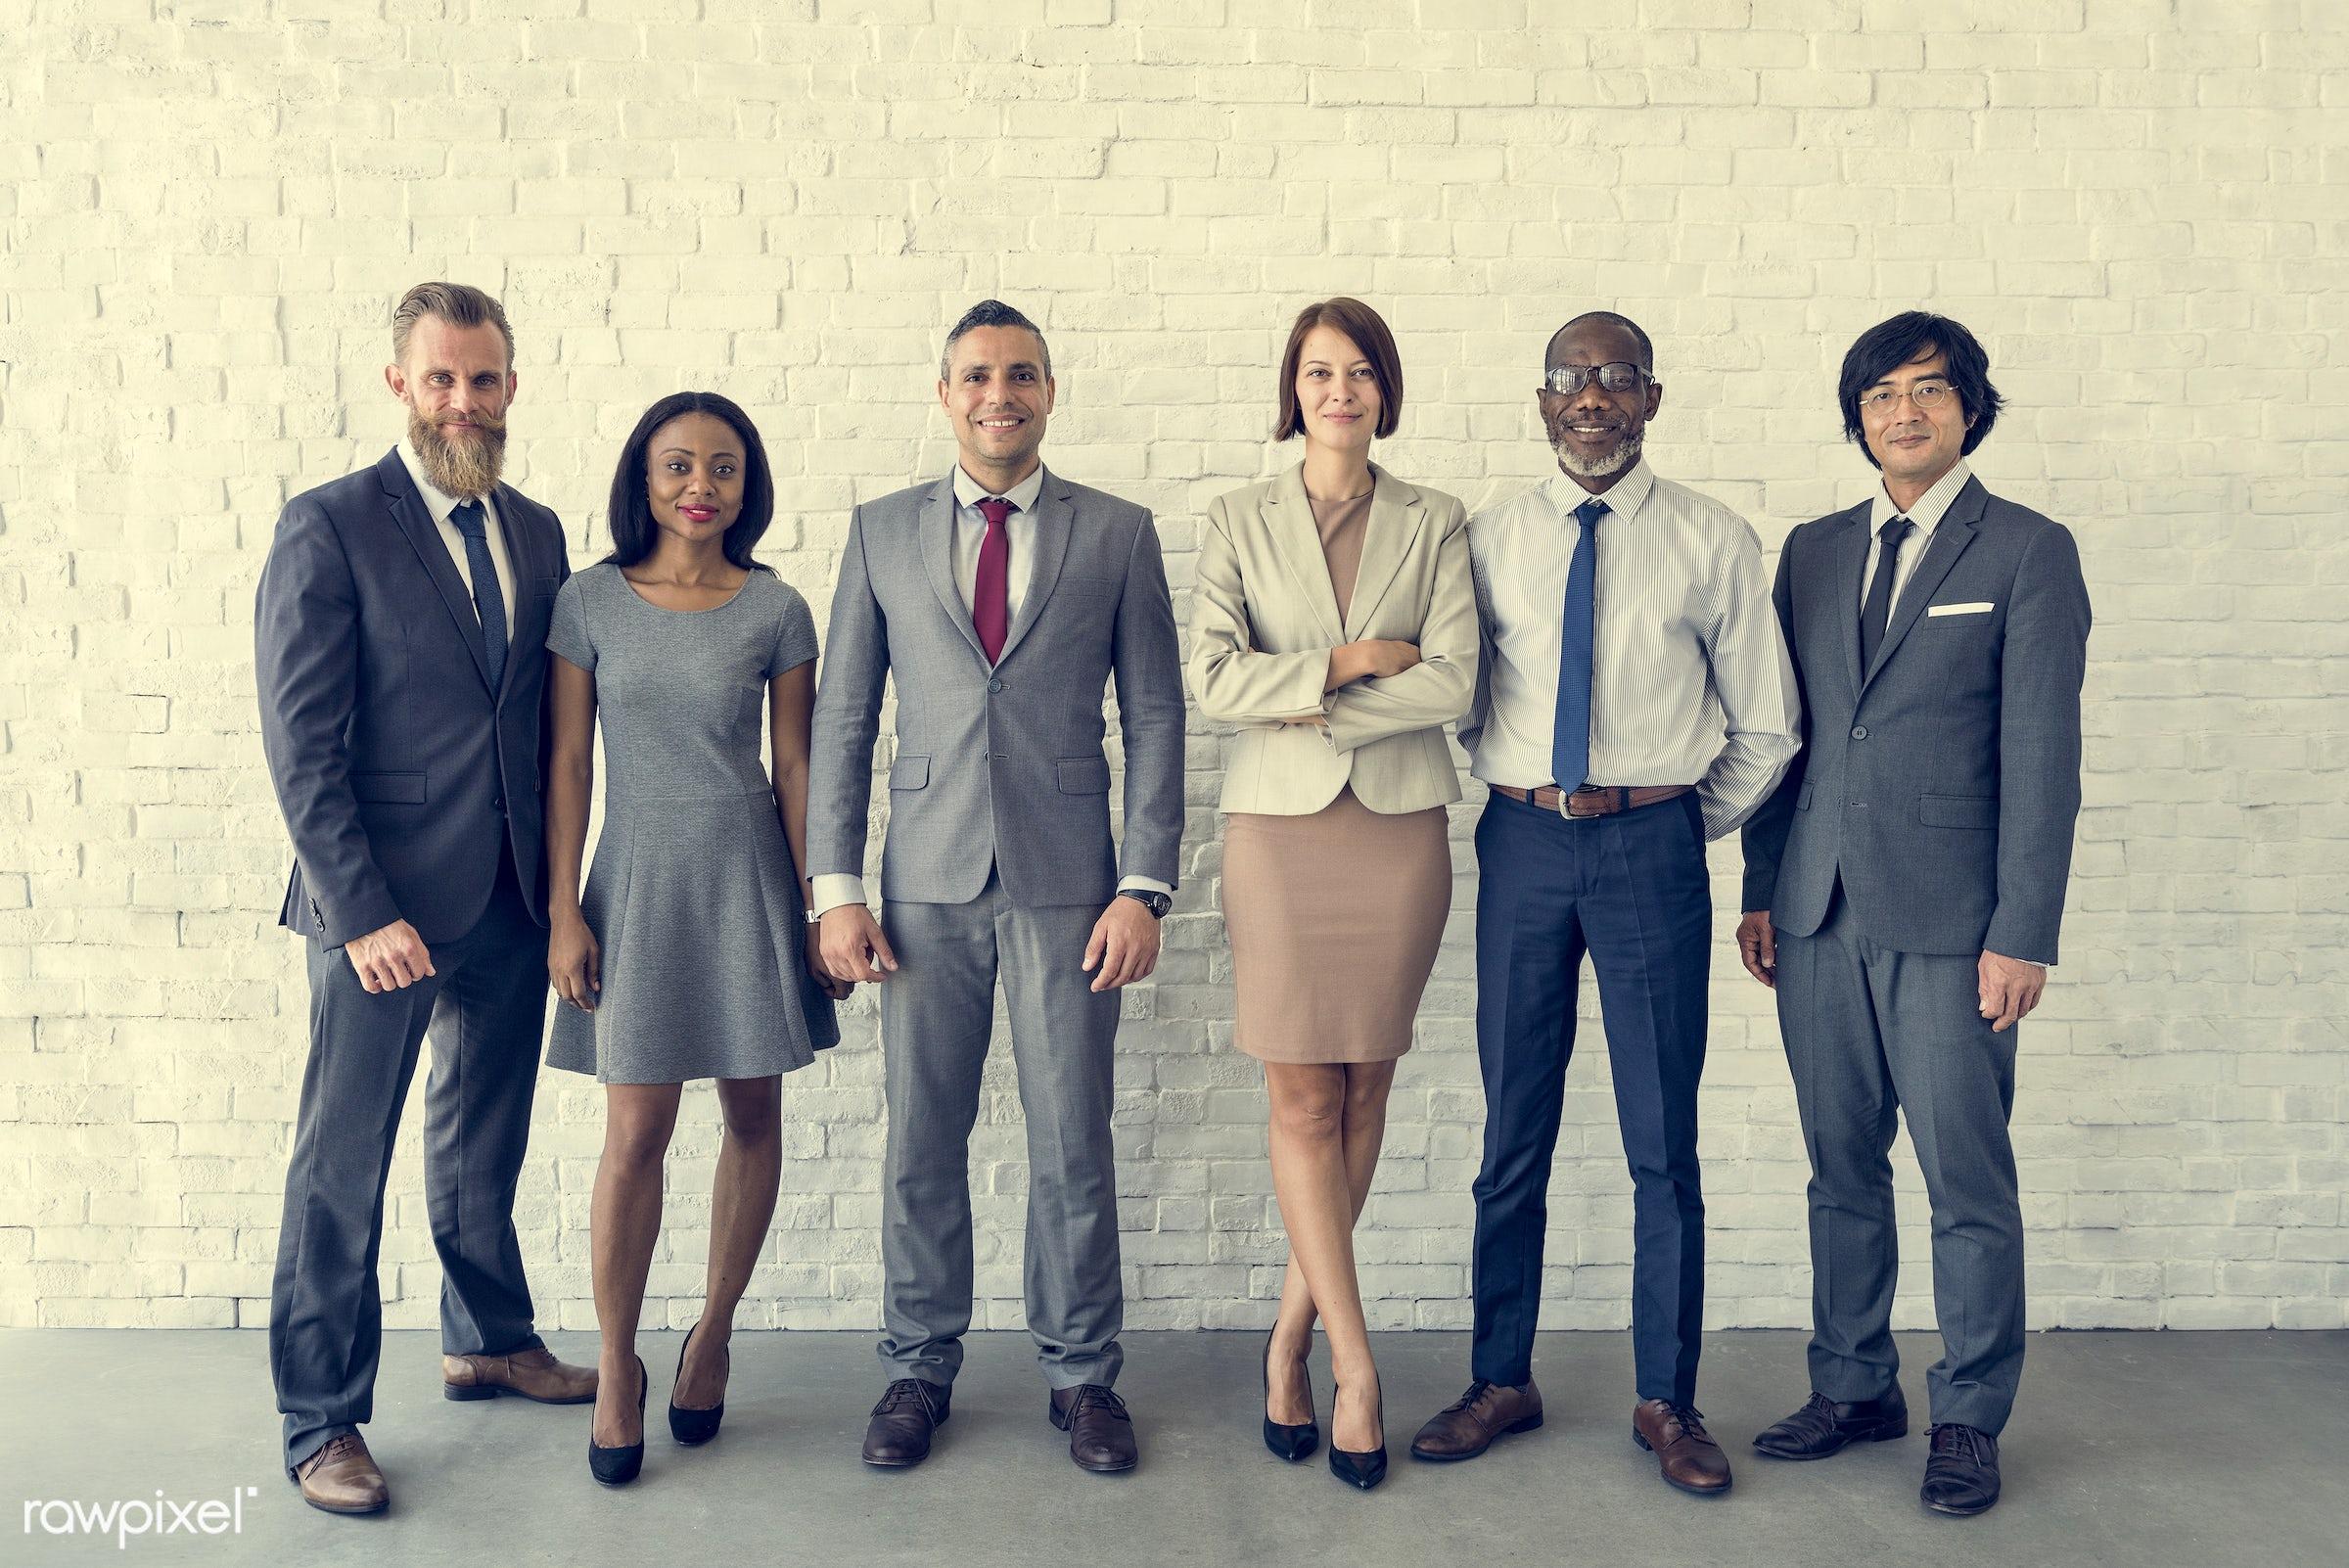 assistance, variation, analysing, corporation, people, business, teamwork, friends, friendship, men, coworker, financial,...